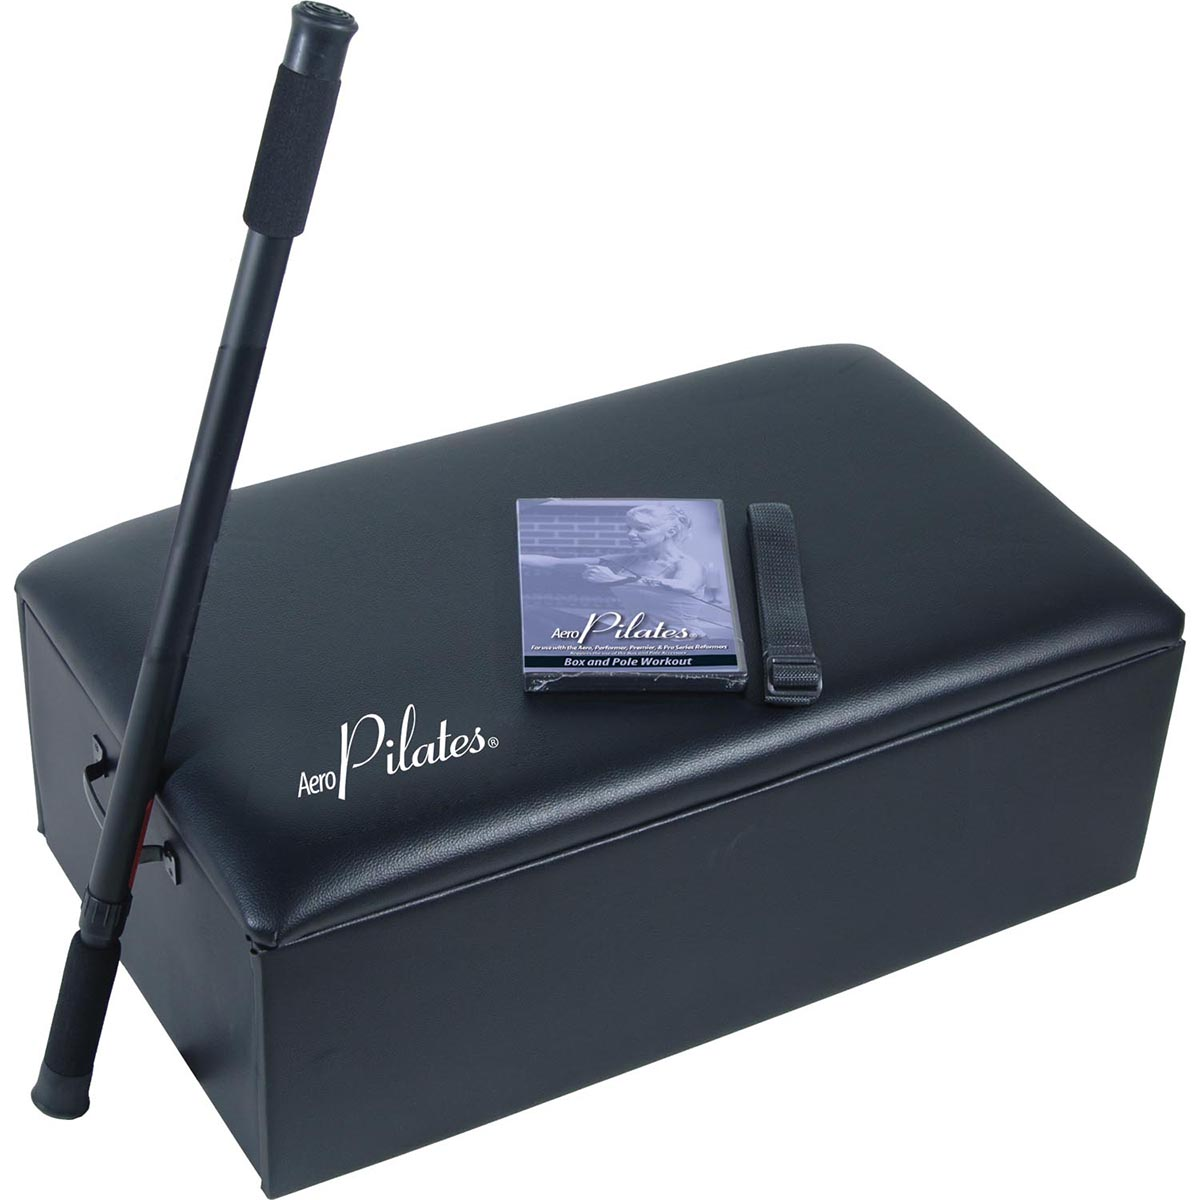 Pilates Box Amp Pole W63093 Stamina 05 0025 Pilates